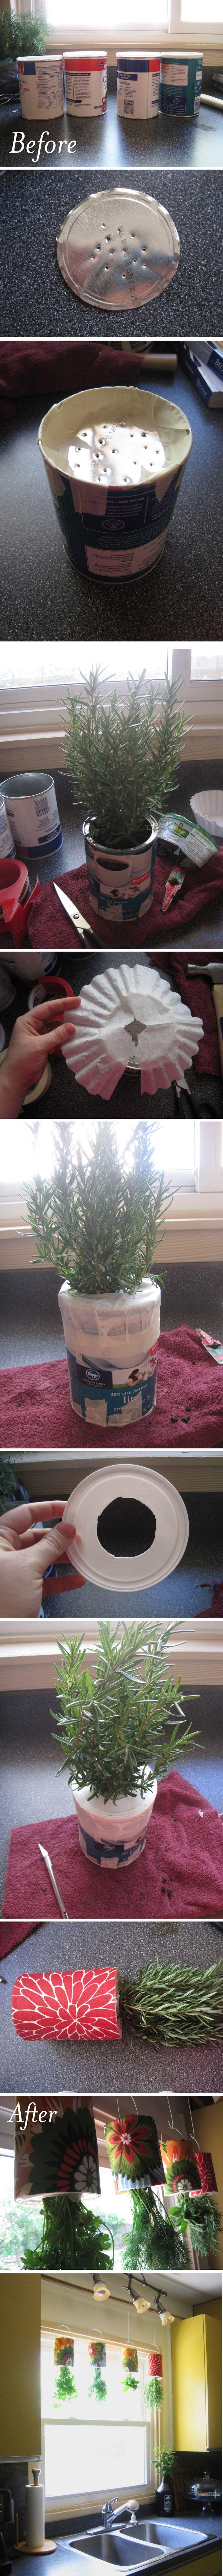 Diy upside down herb garden